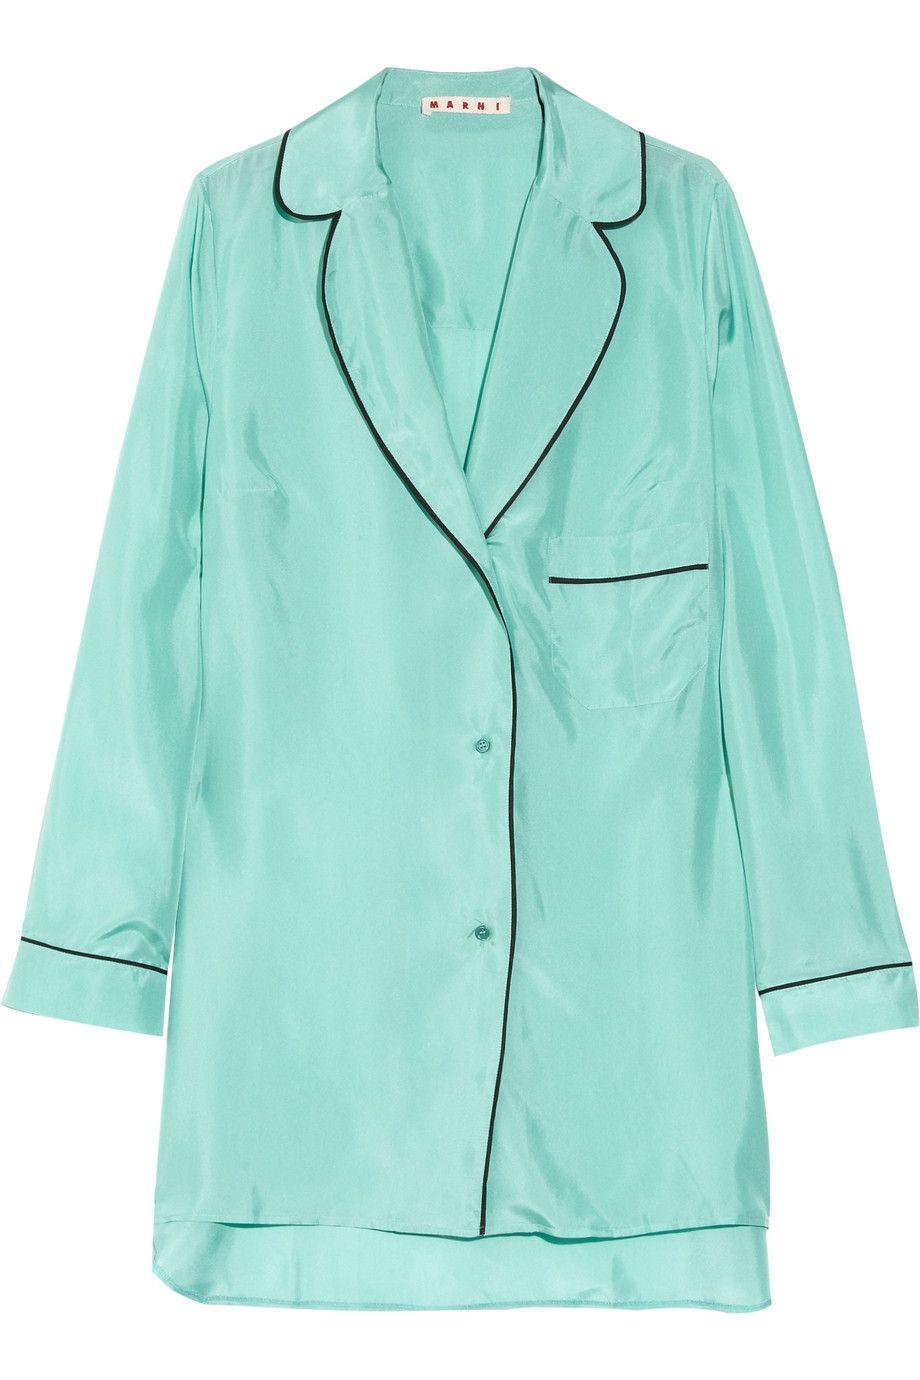 3f67b0d572 Marni Oversized Silk Pyjama Shirt